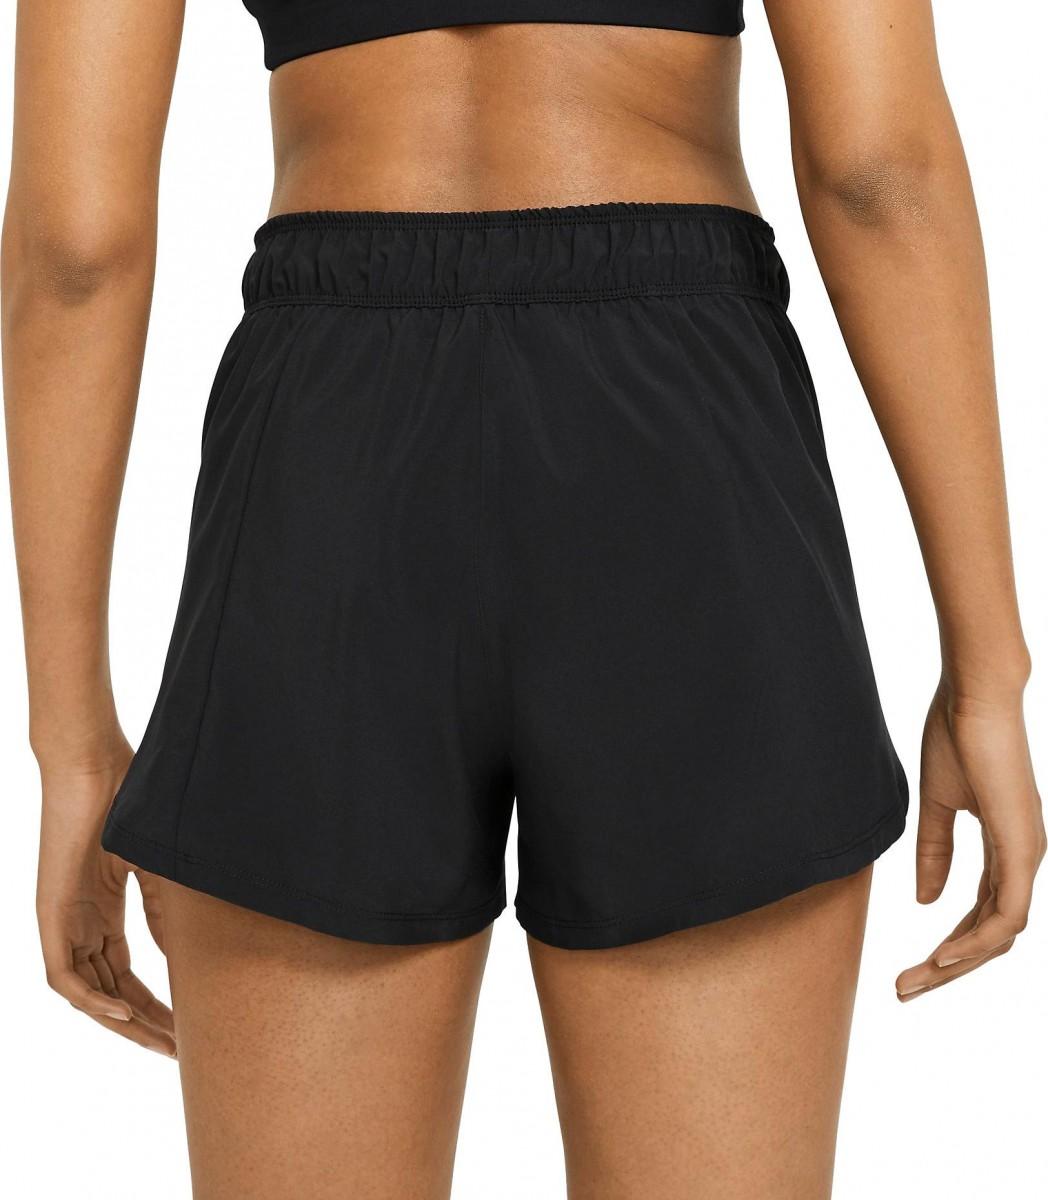 Теннисные шорты женские Nike Flex 2in1 Short black/vivid pink